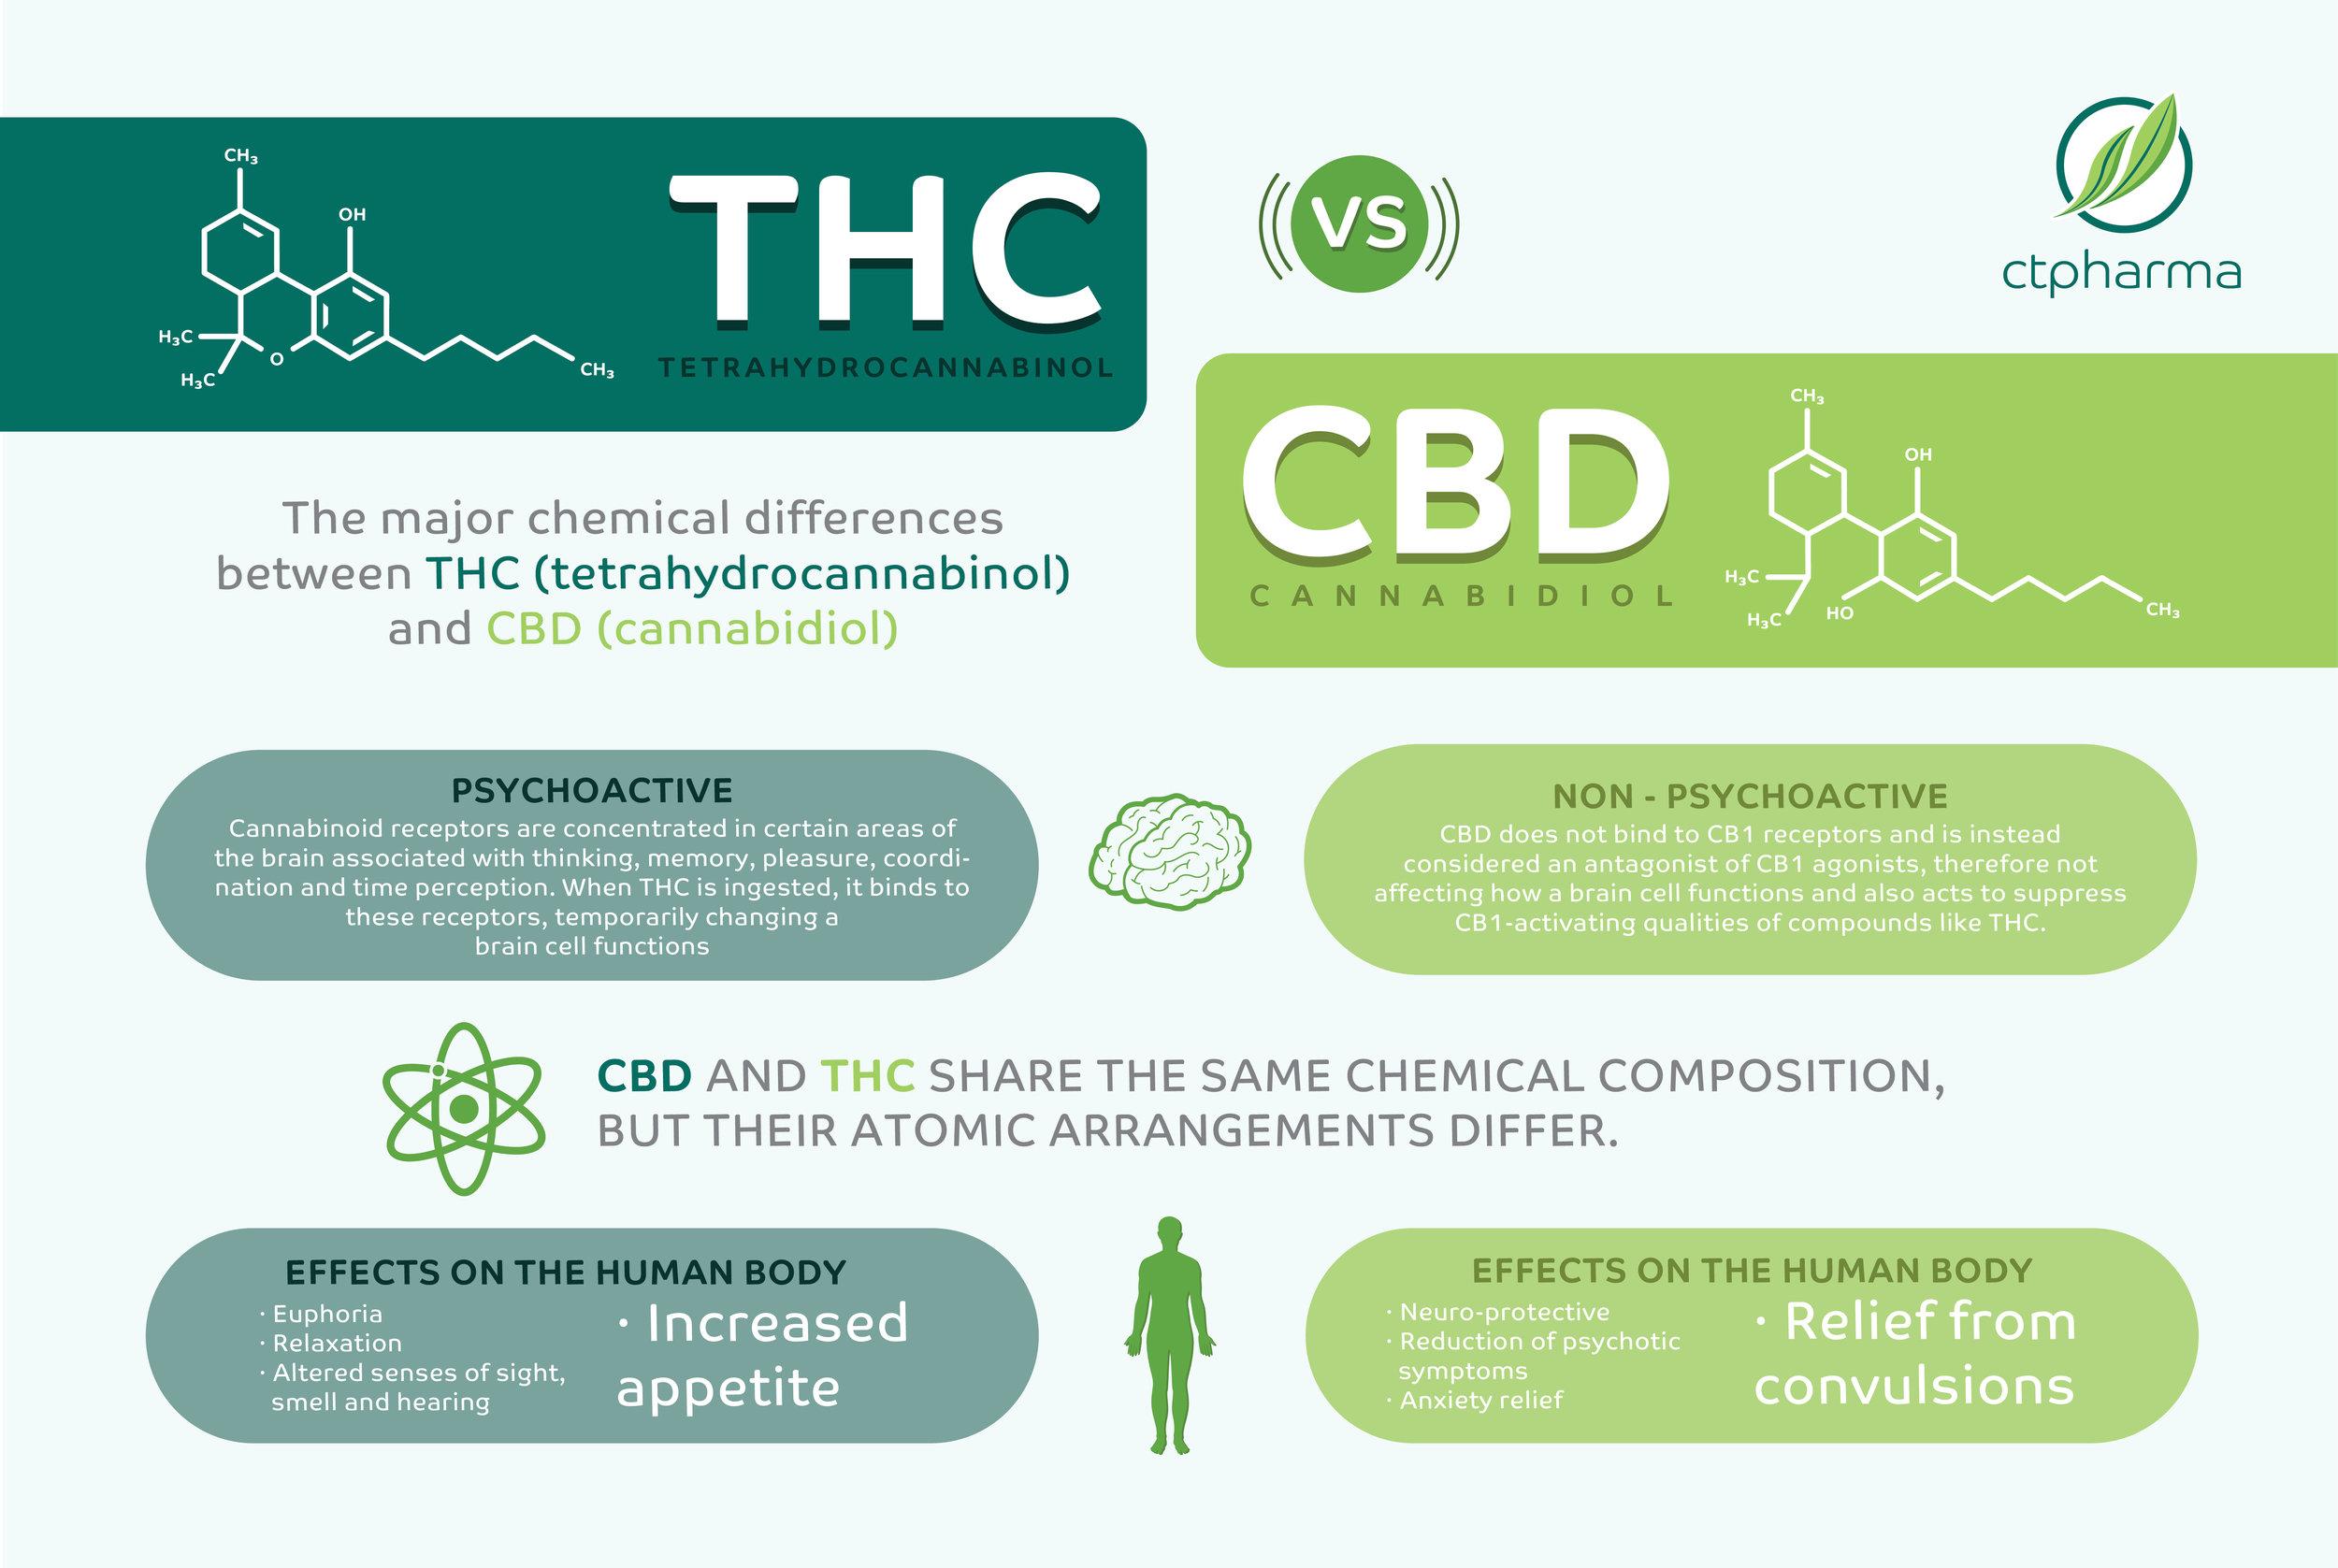 THC_CBD_Infographic-01.jpg